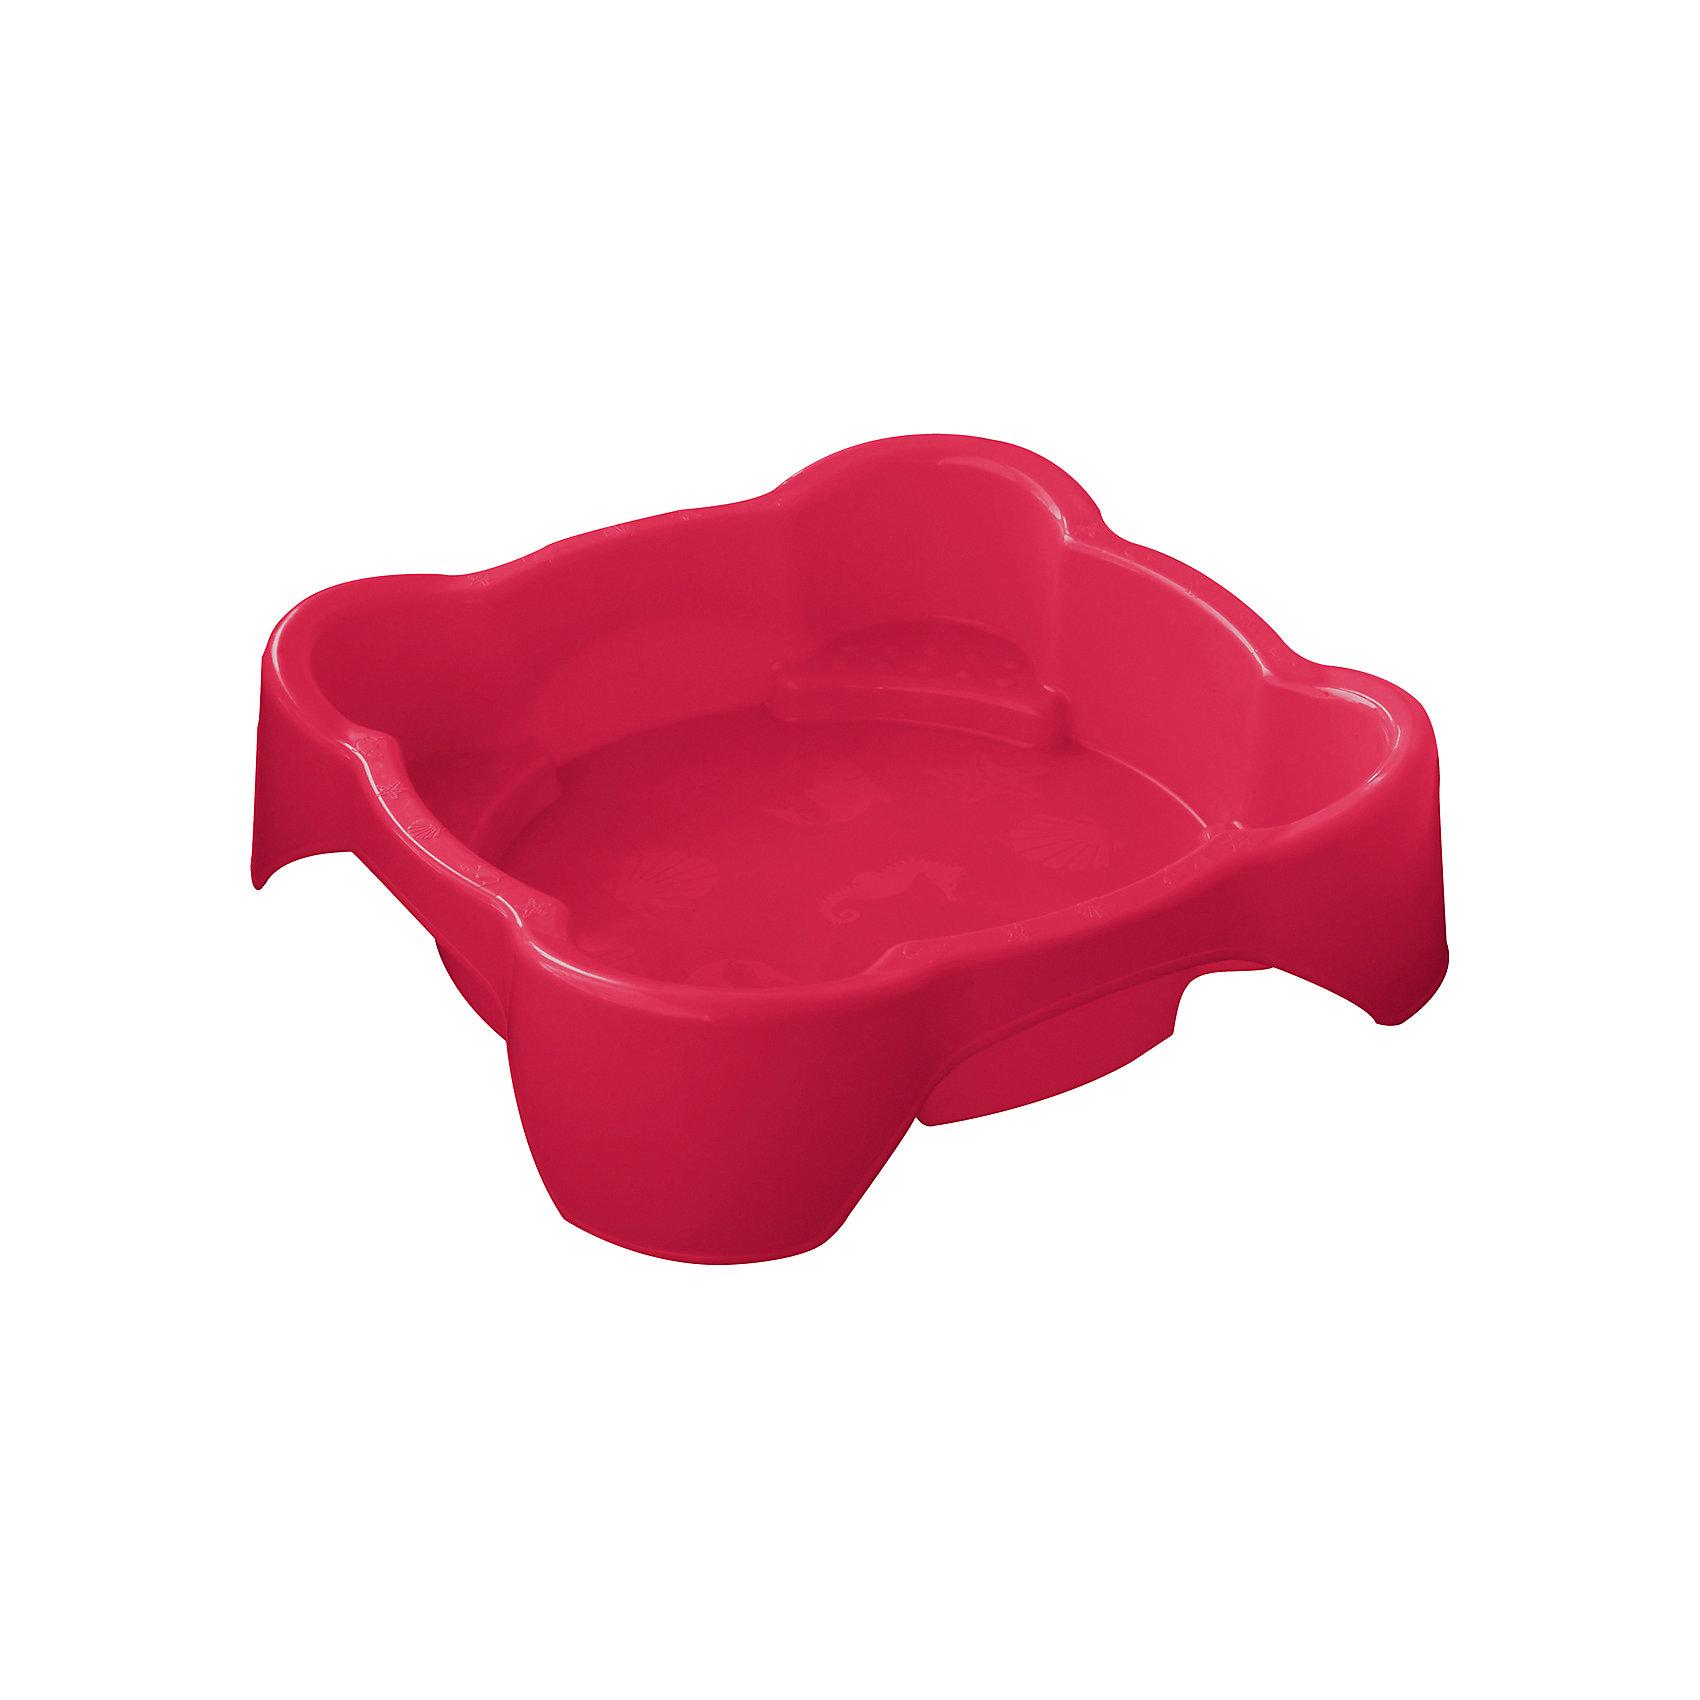 Песочница квадратная, красная, Marianplast